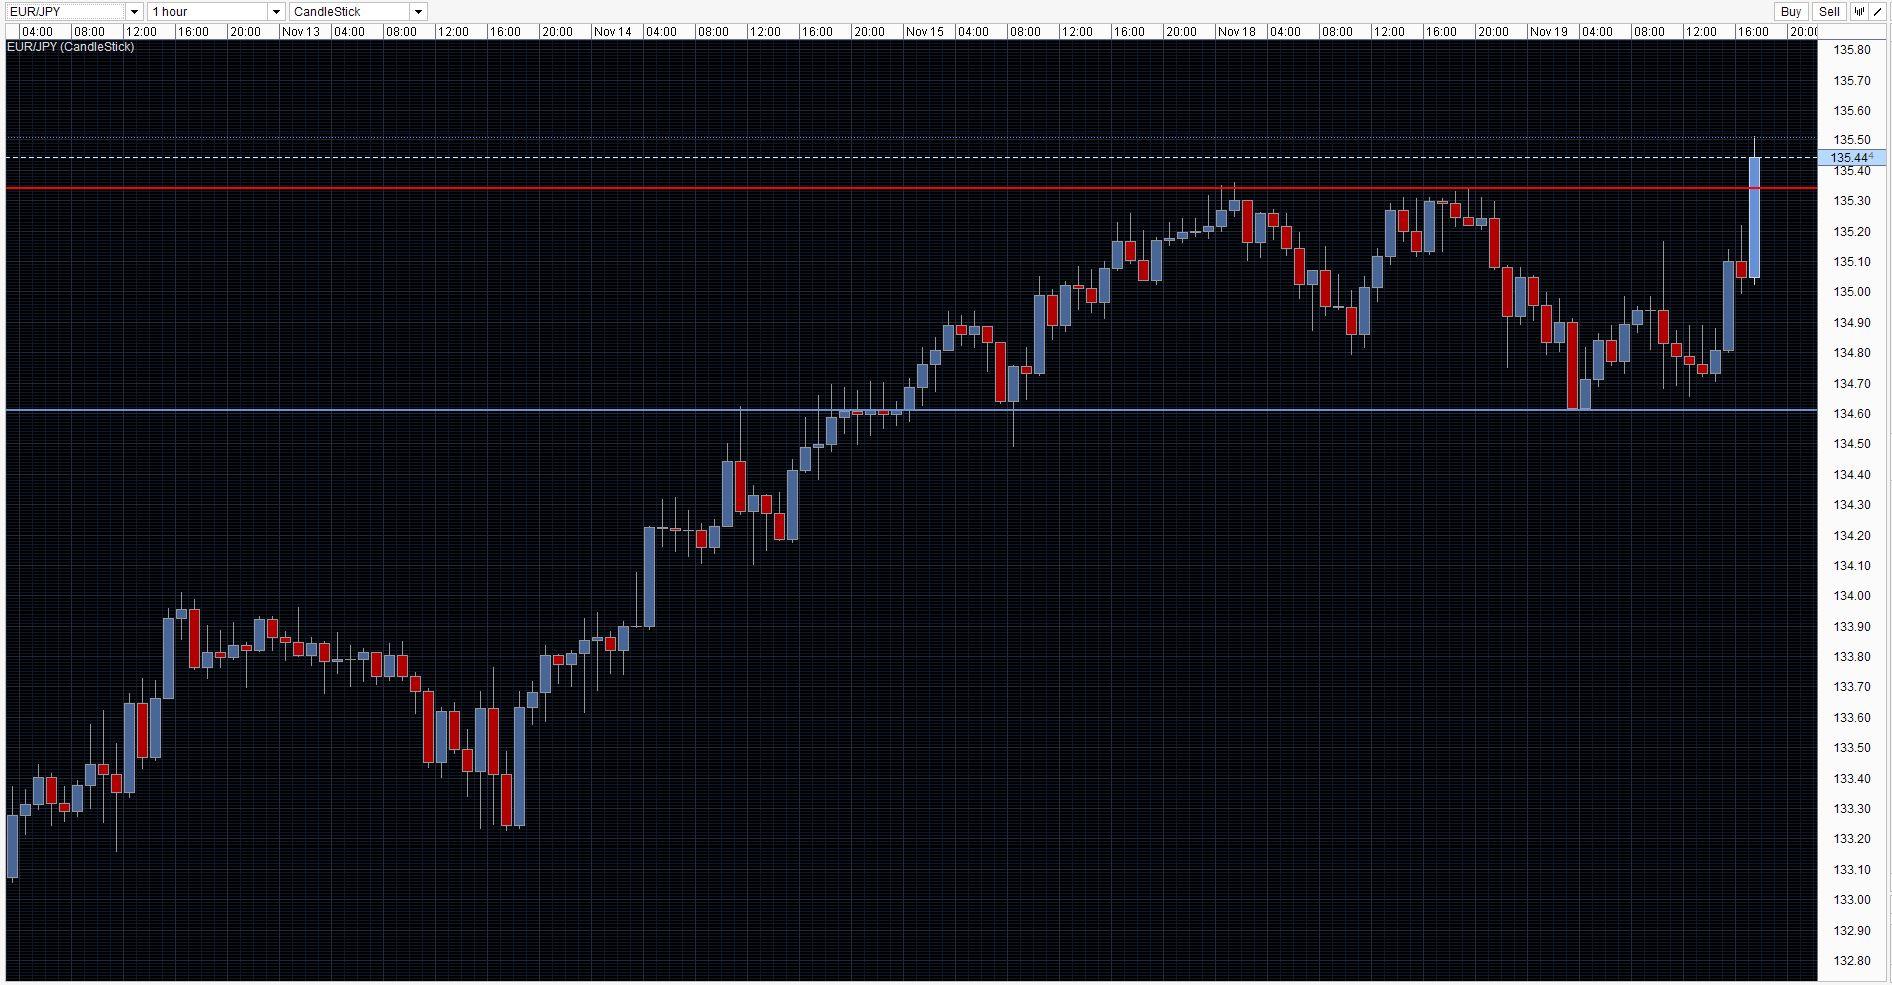 EUR/JPY Chart 19/11/2013